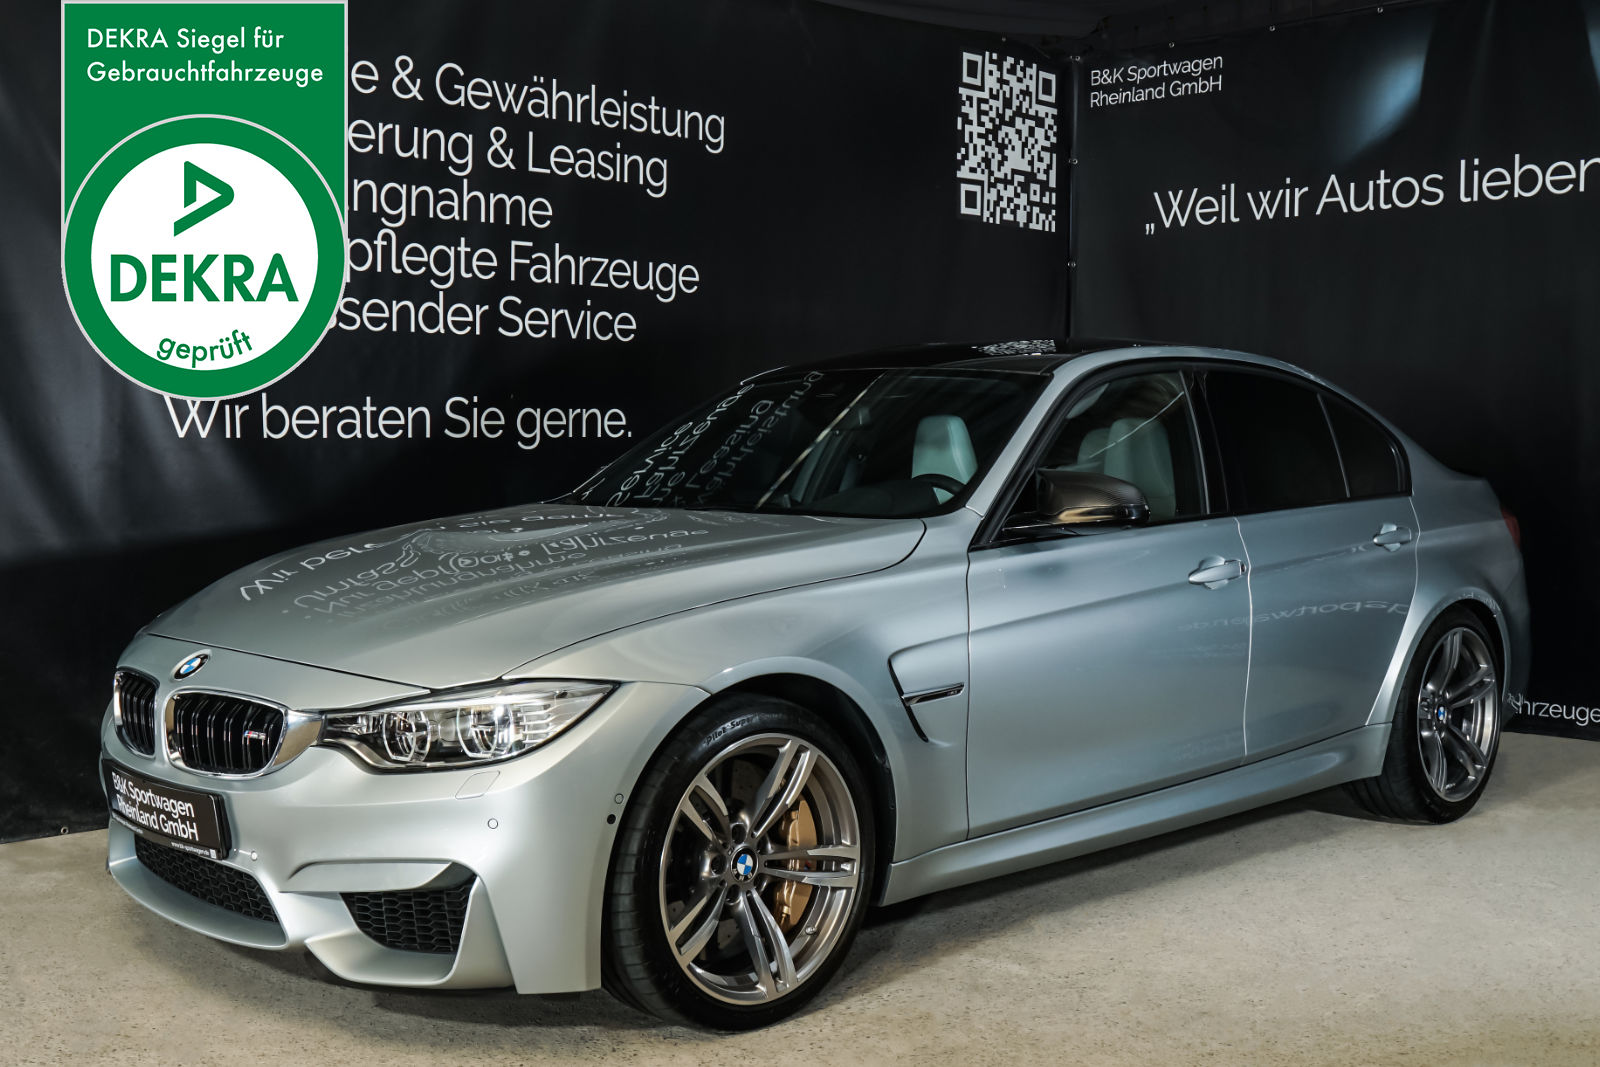 BMW_M3_Silber_Weiß_BMW-4554_Plakette_w